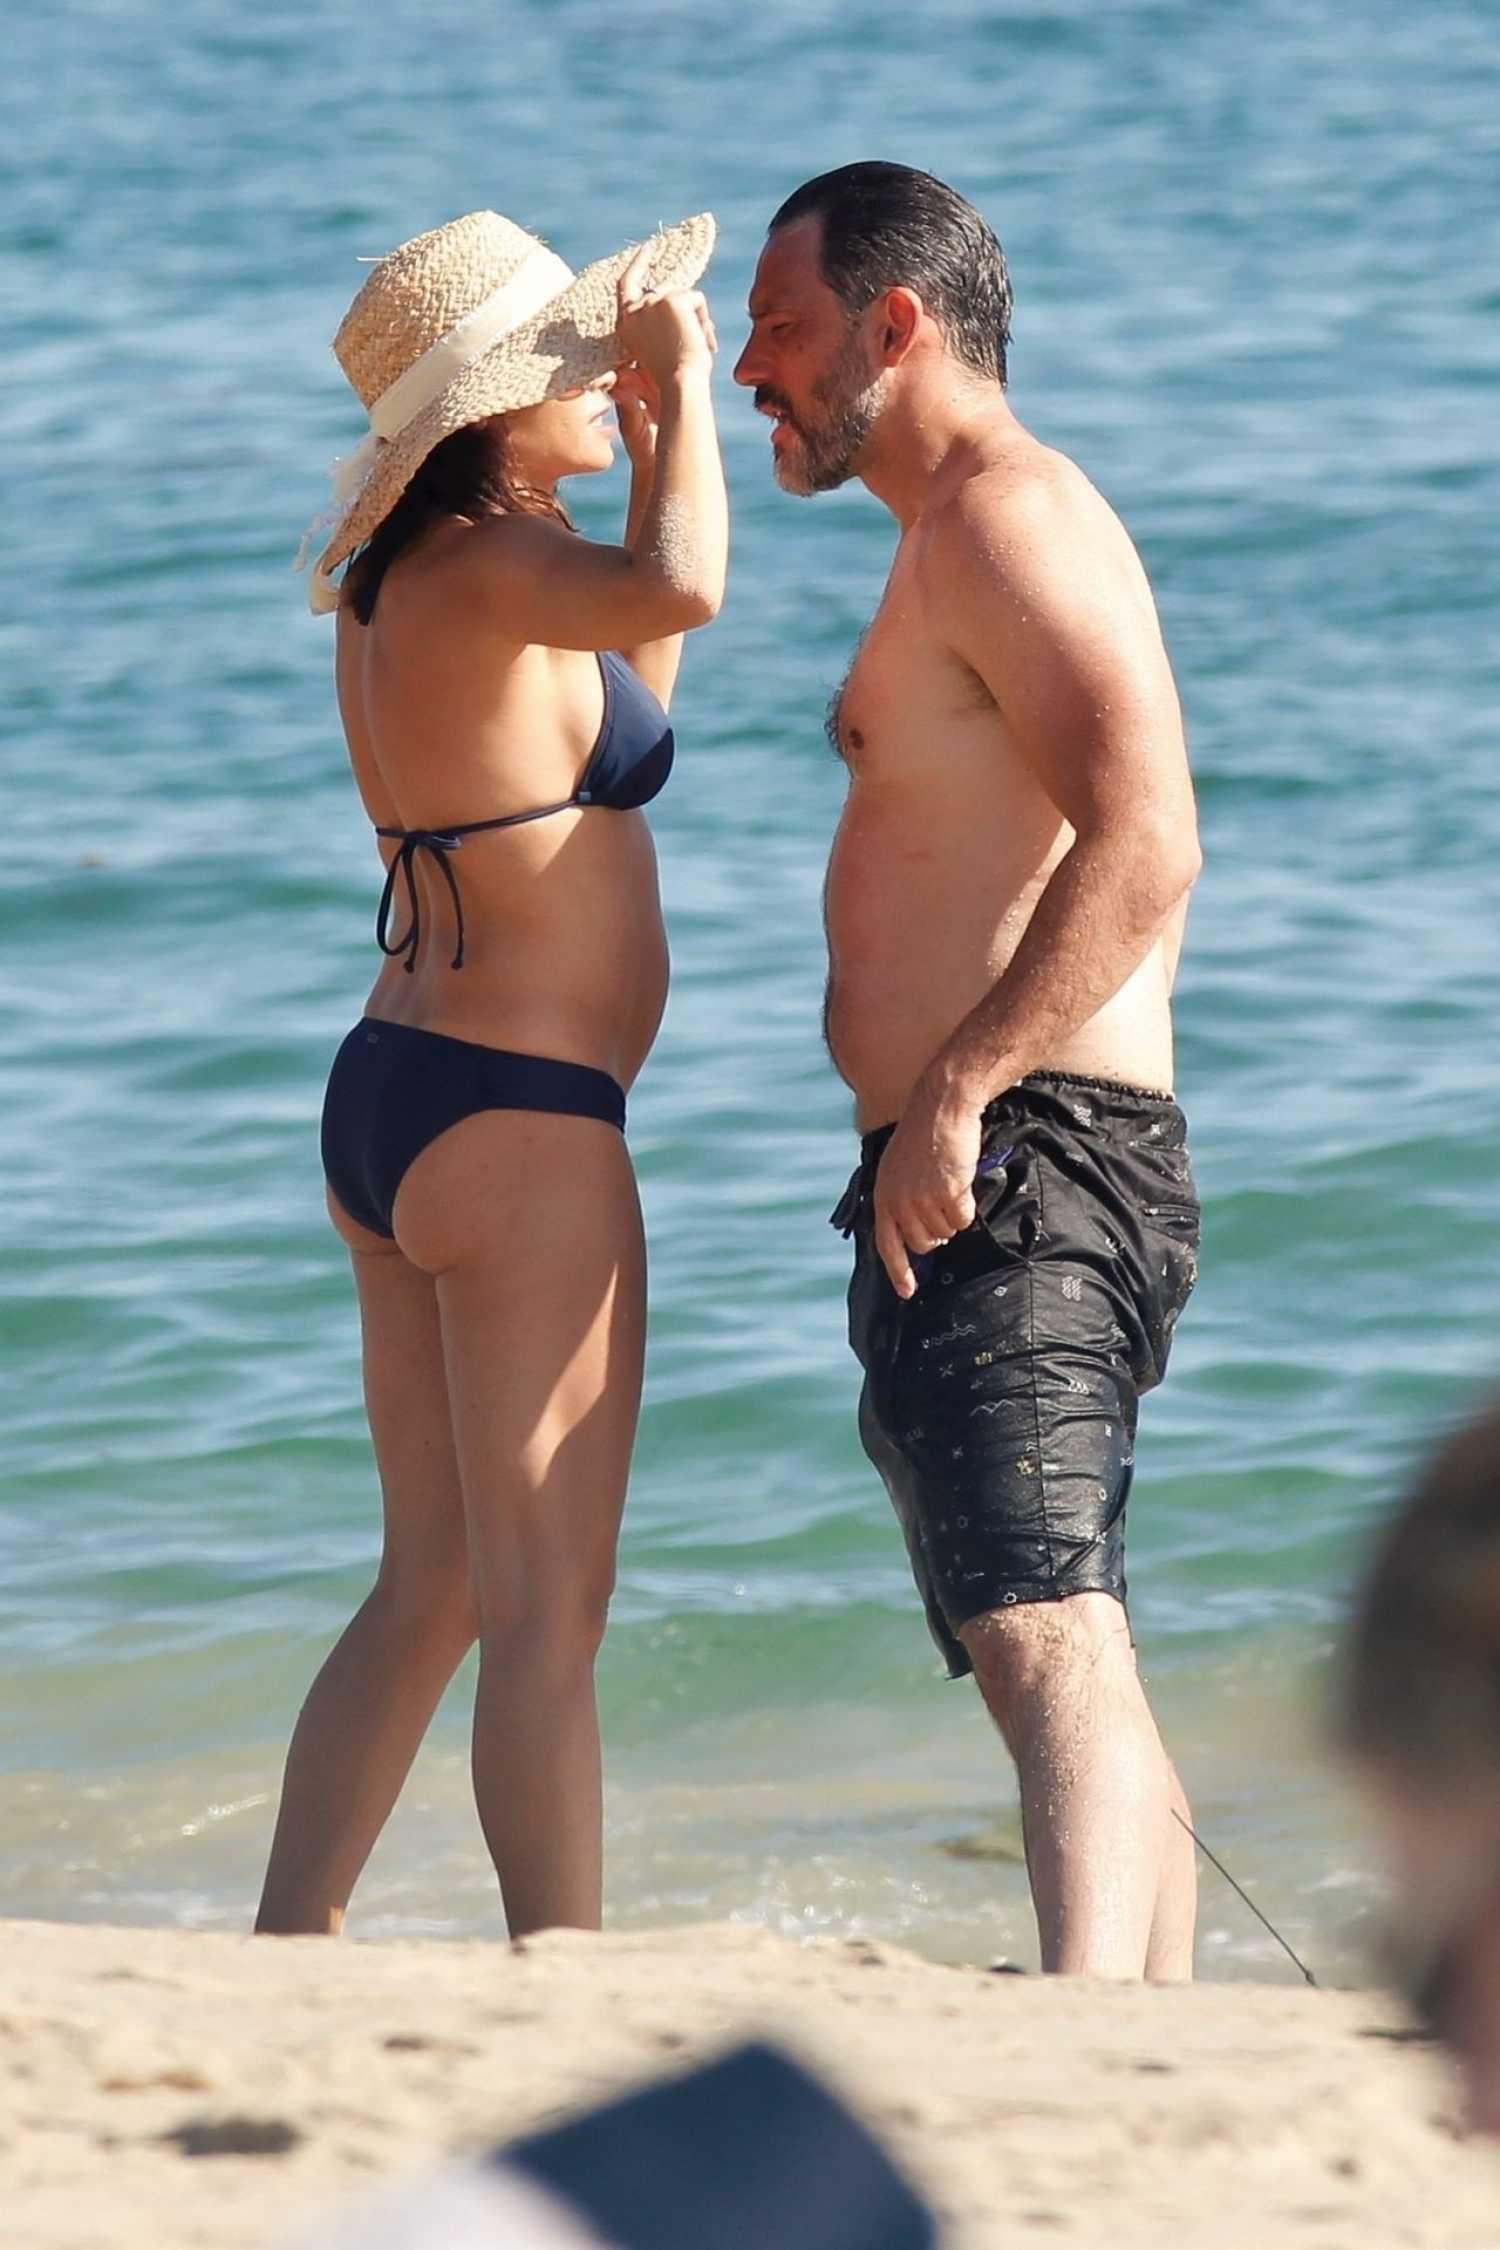 Jenna Dewan In A Blue Bikini On The Beach In Laguna Beach